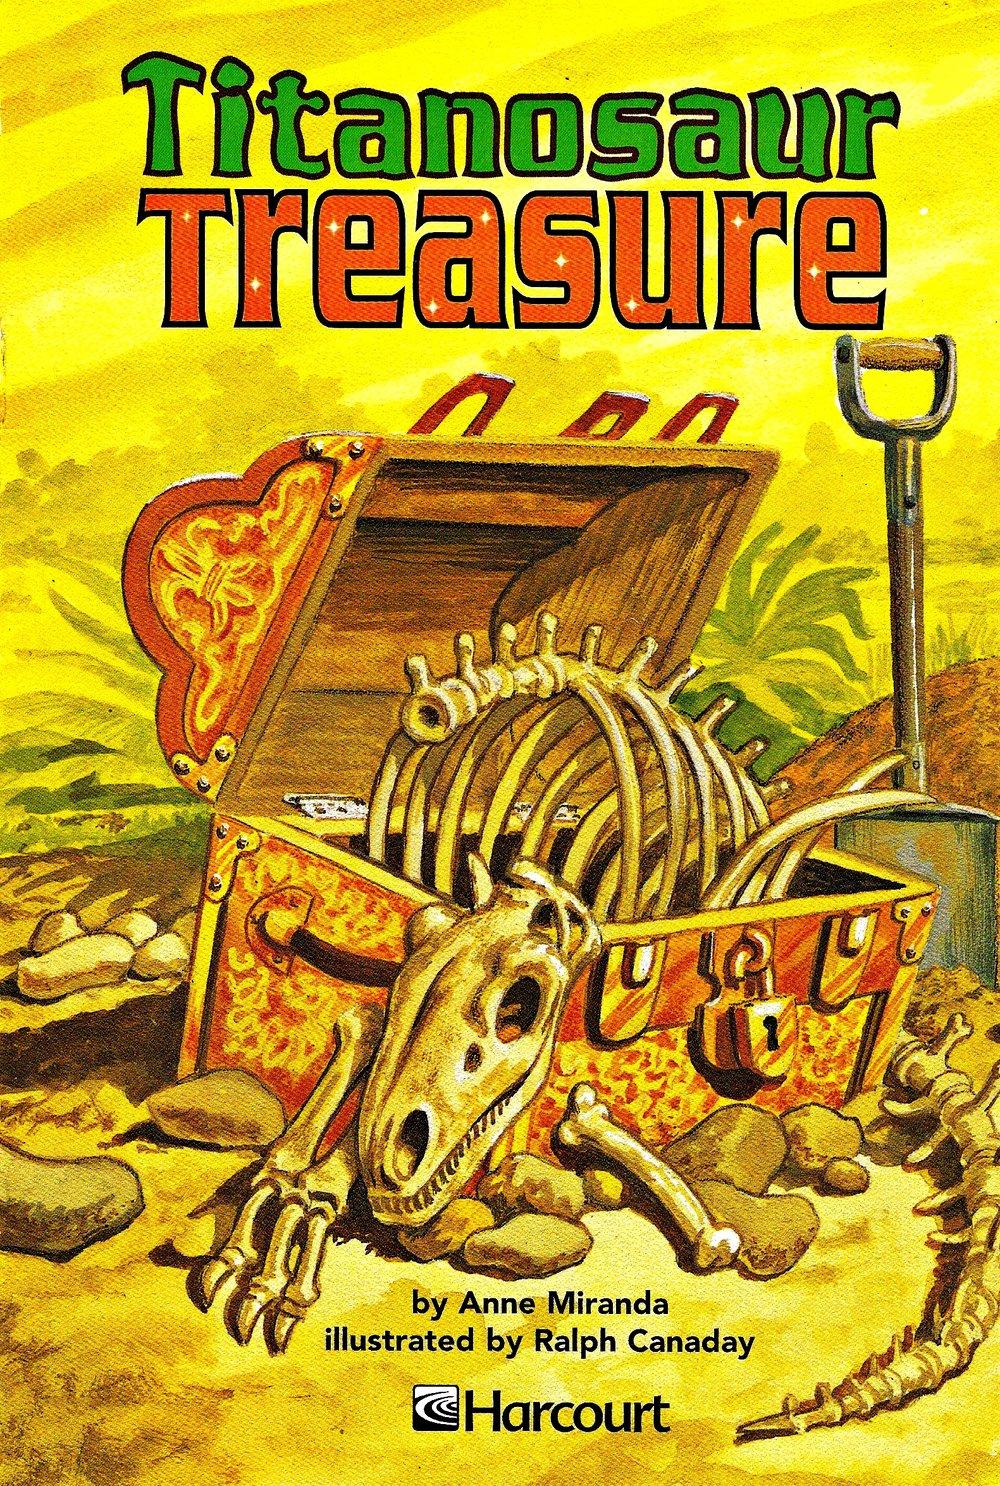 Titantosaur Treasure.jpg